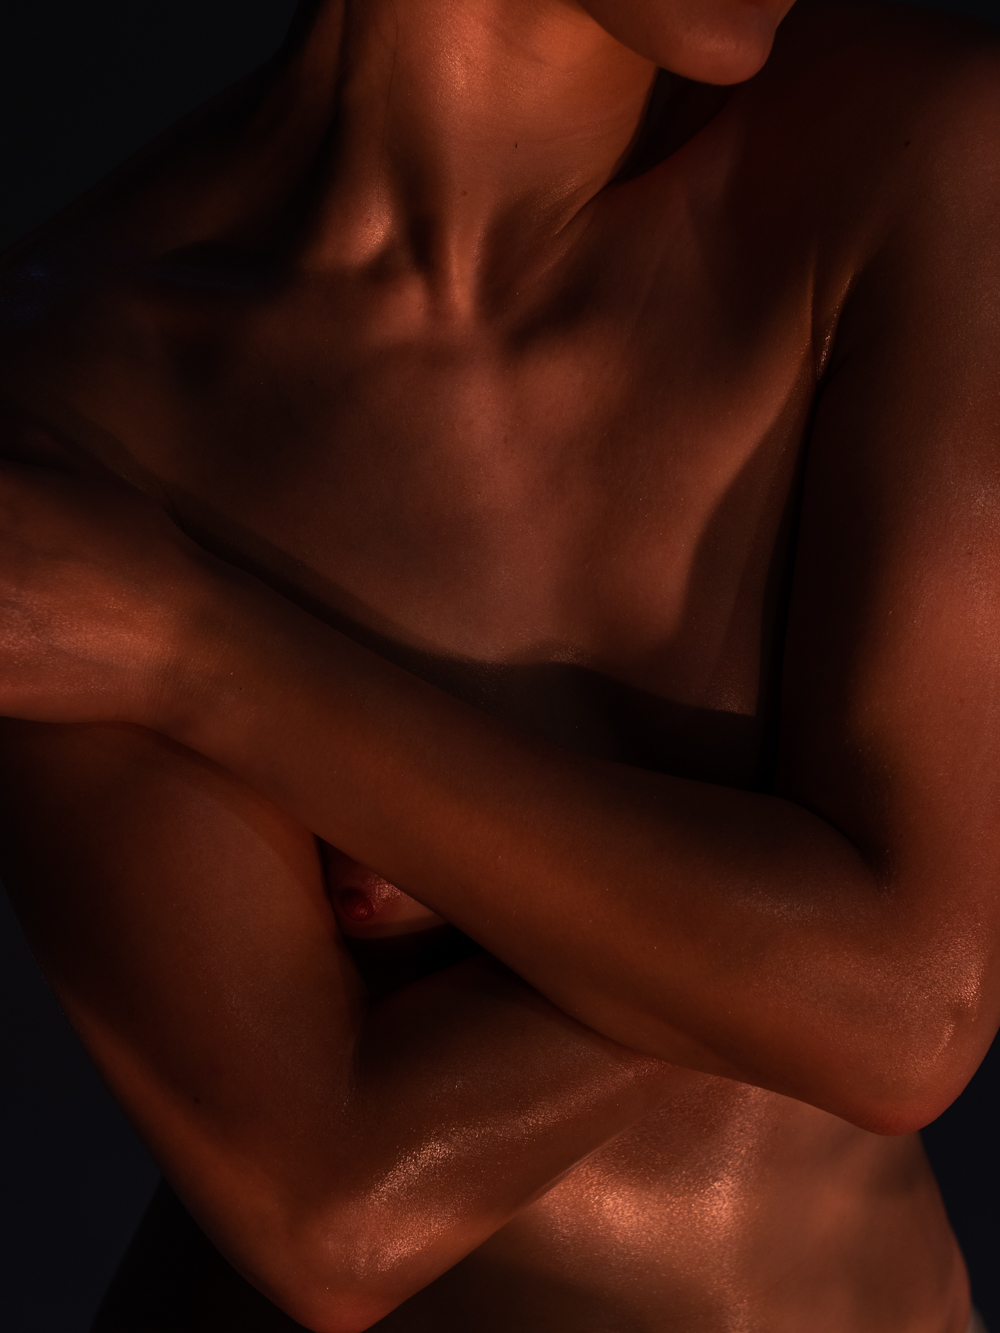 Ближе к телу: специальная съемка Louis Vuitton x BURO. (фото 8)